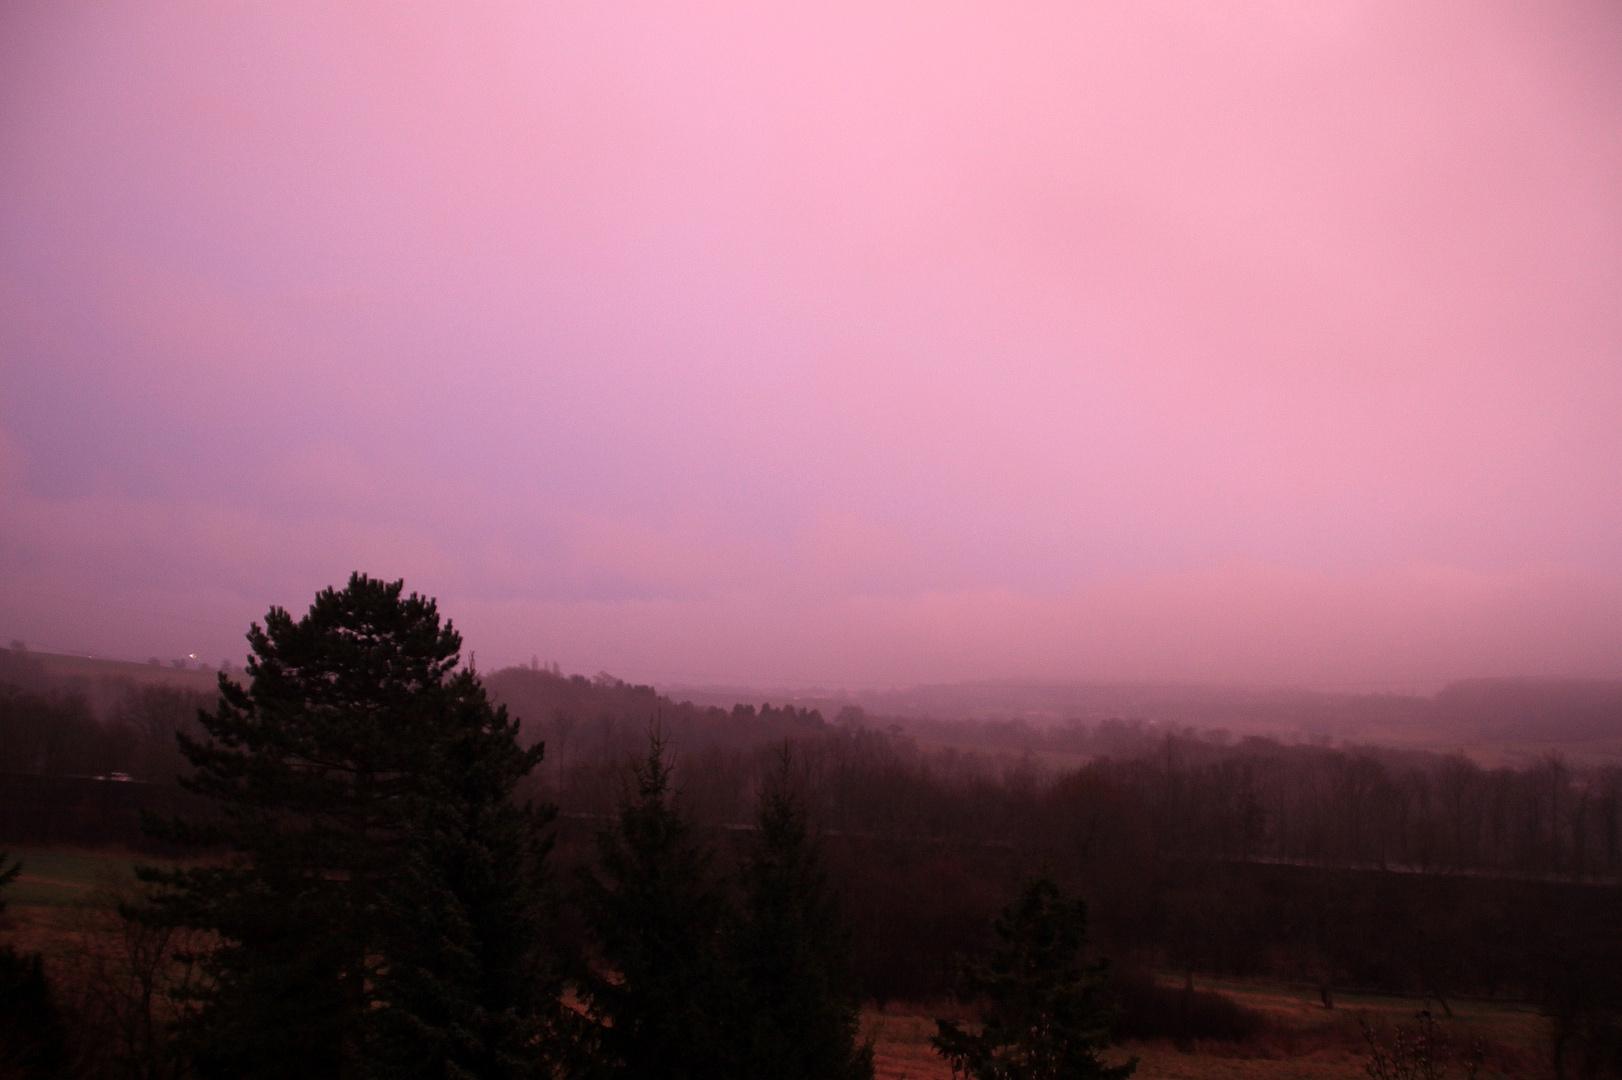 rosafarben